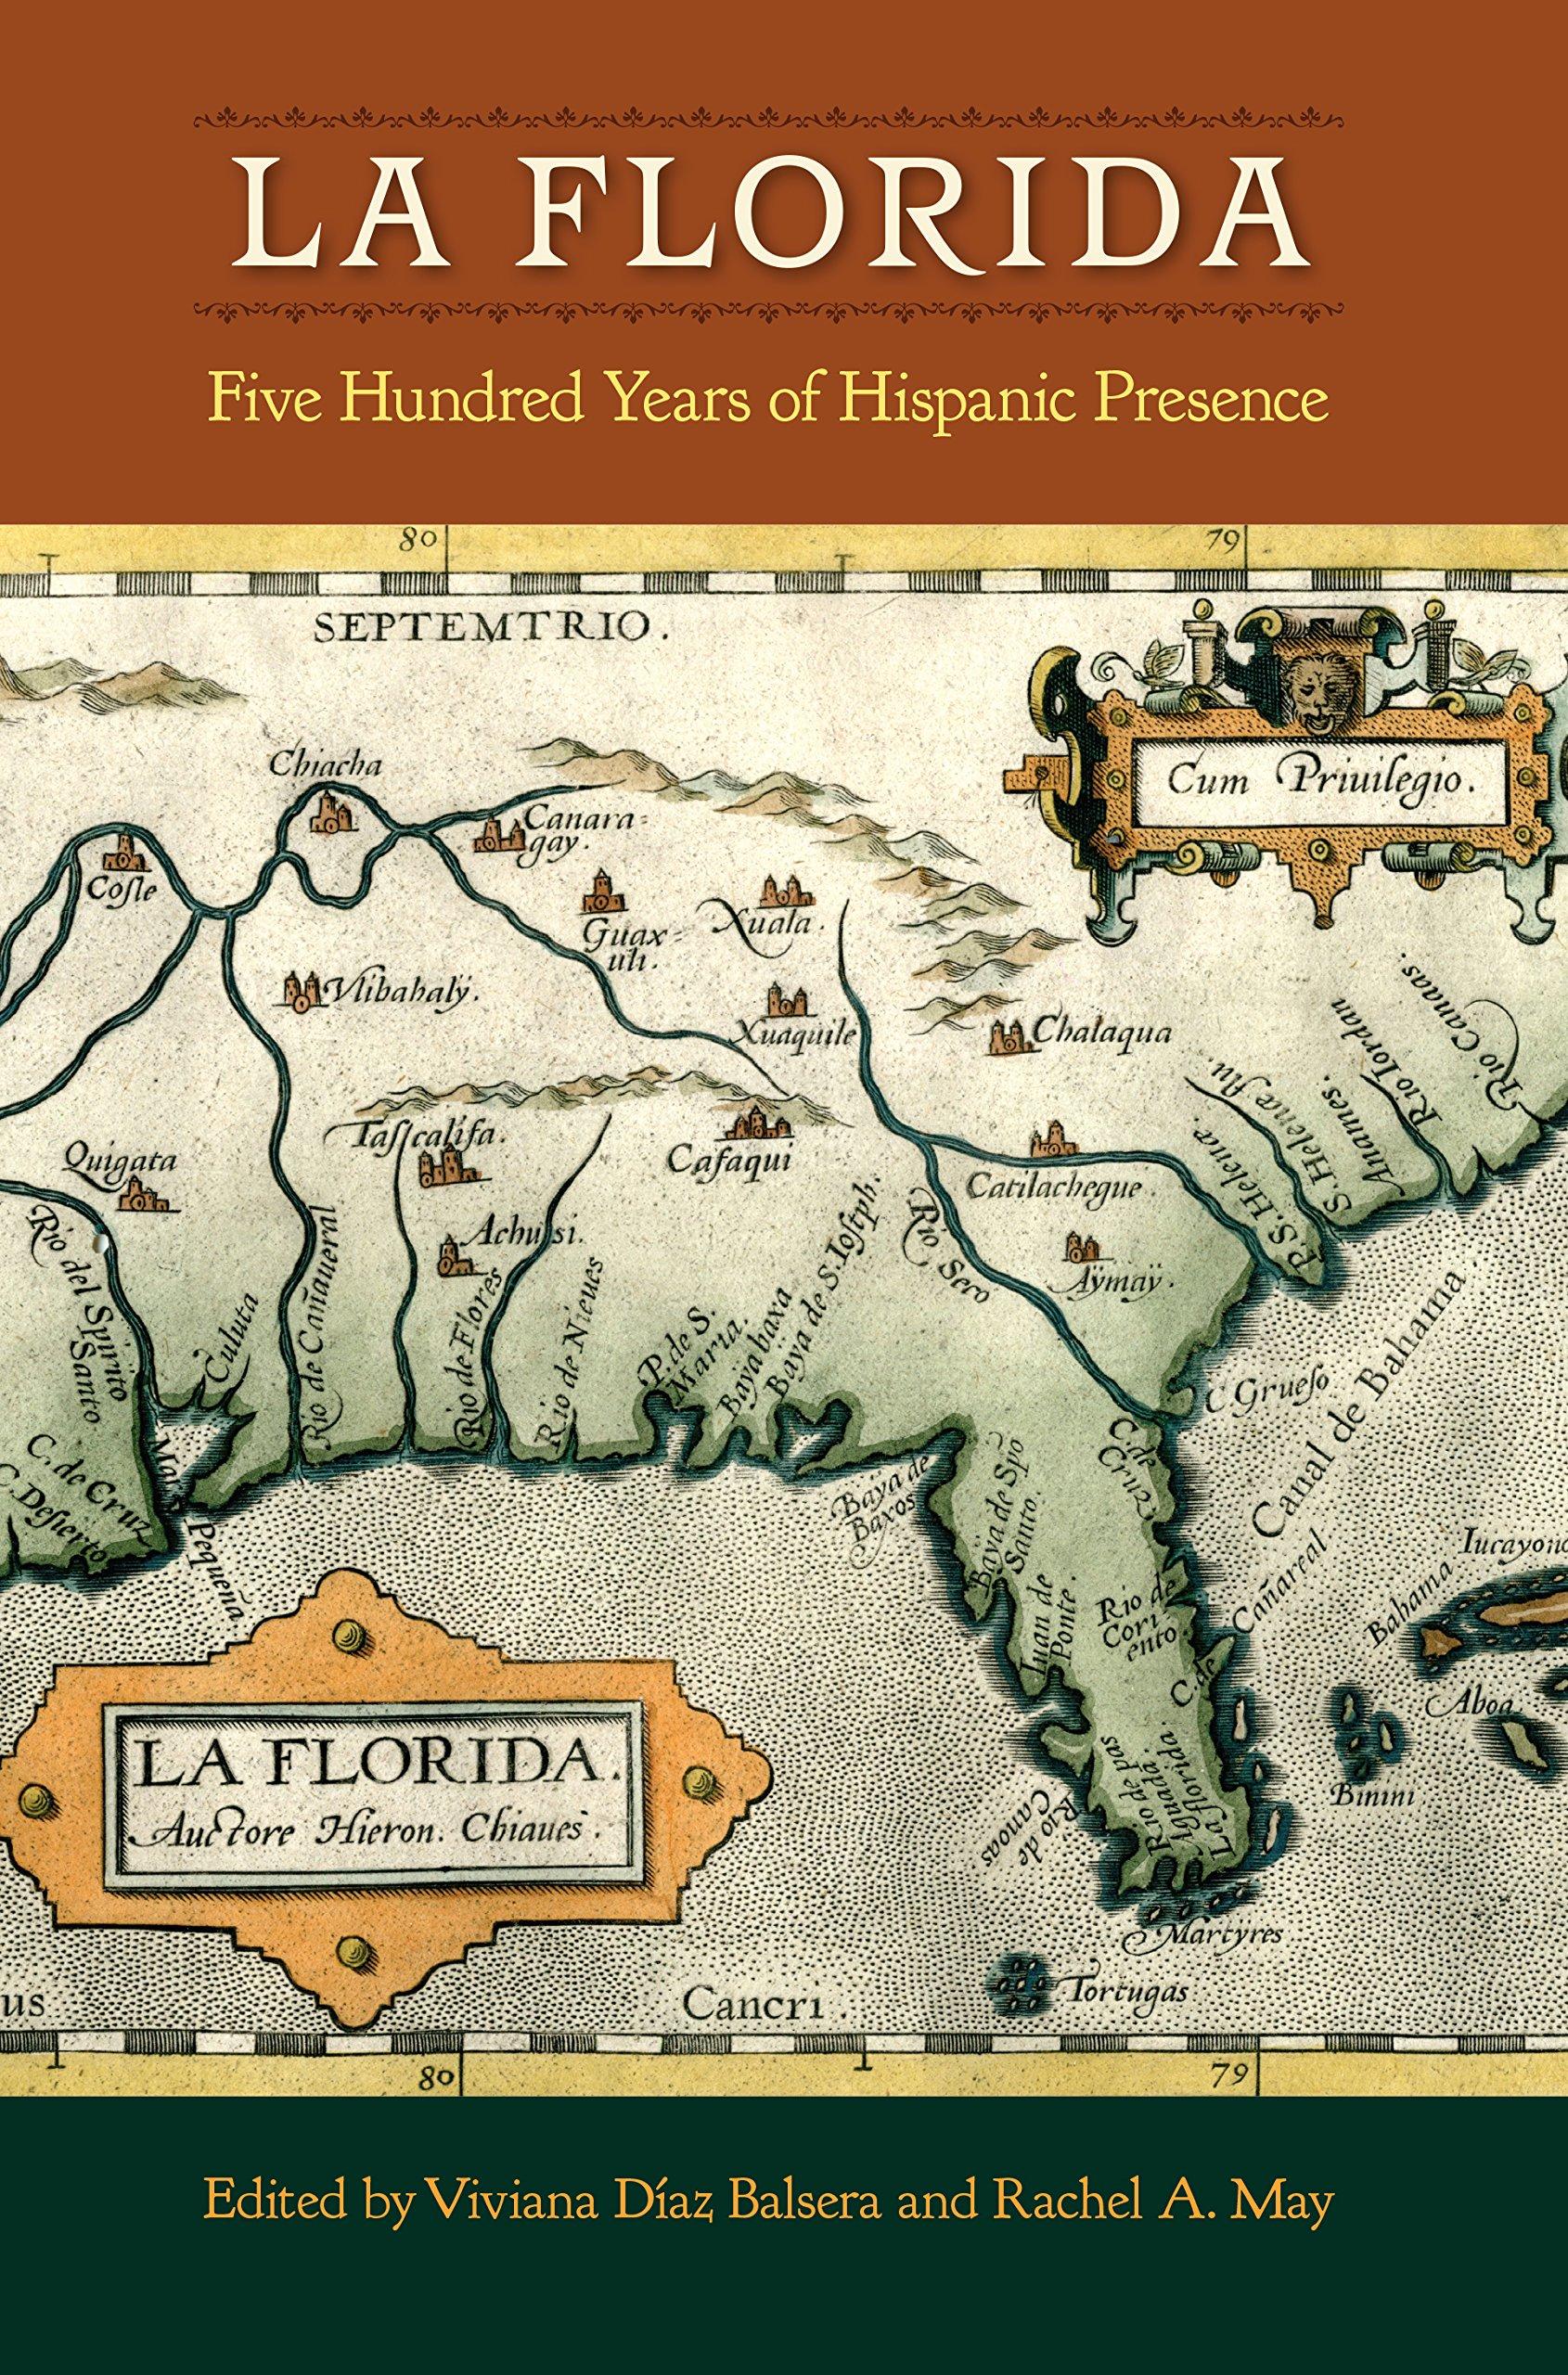 La Florida: Five Hundred Years of Hispanic Presence ebook